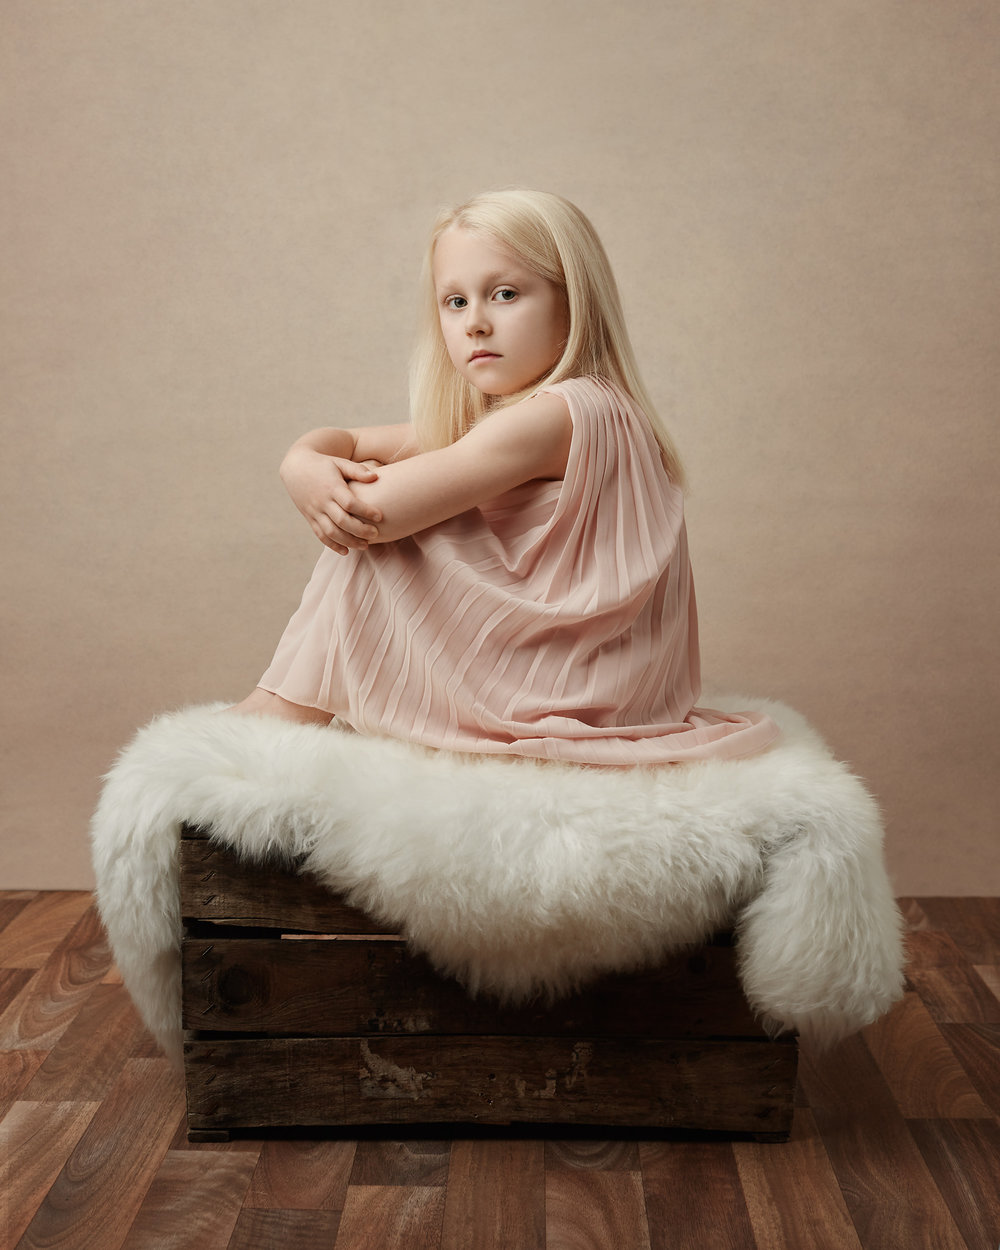 Lily sitting on sheepskin rug